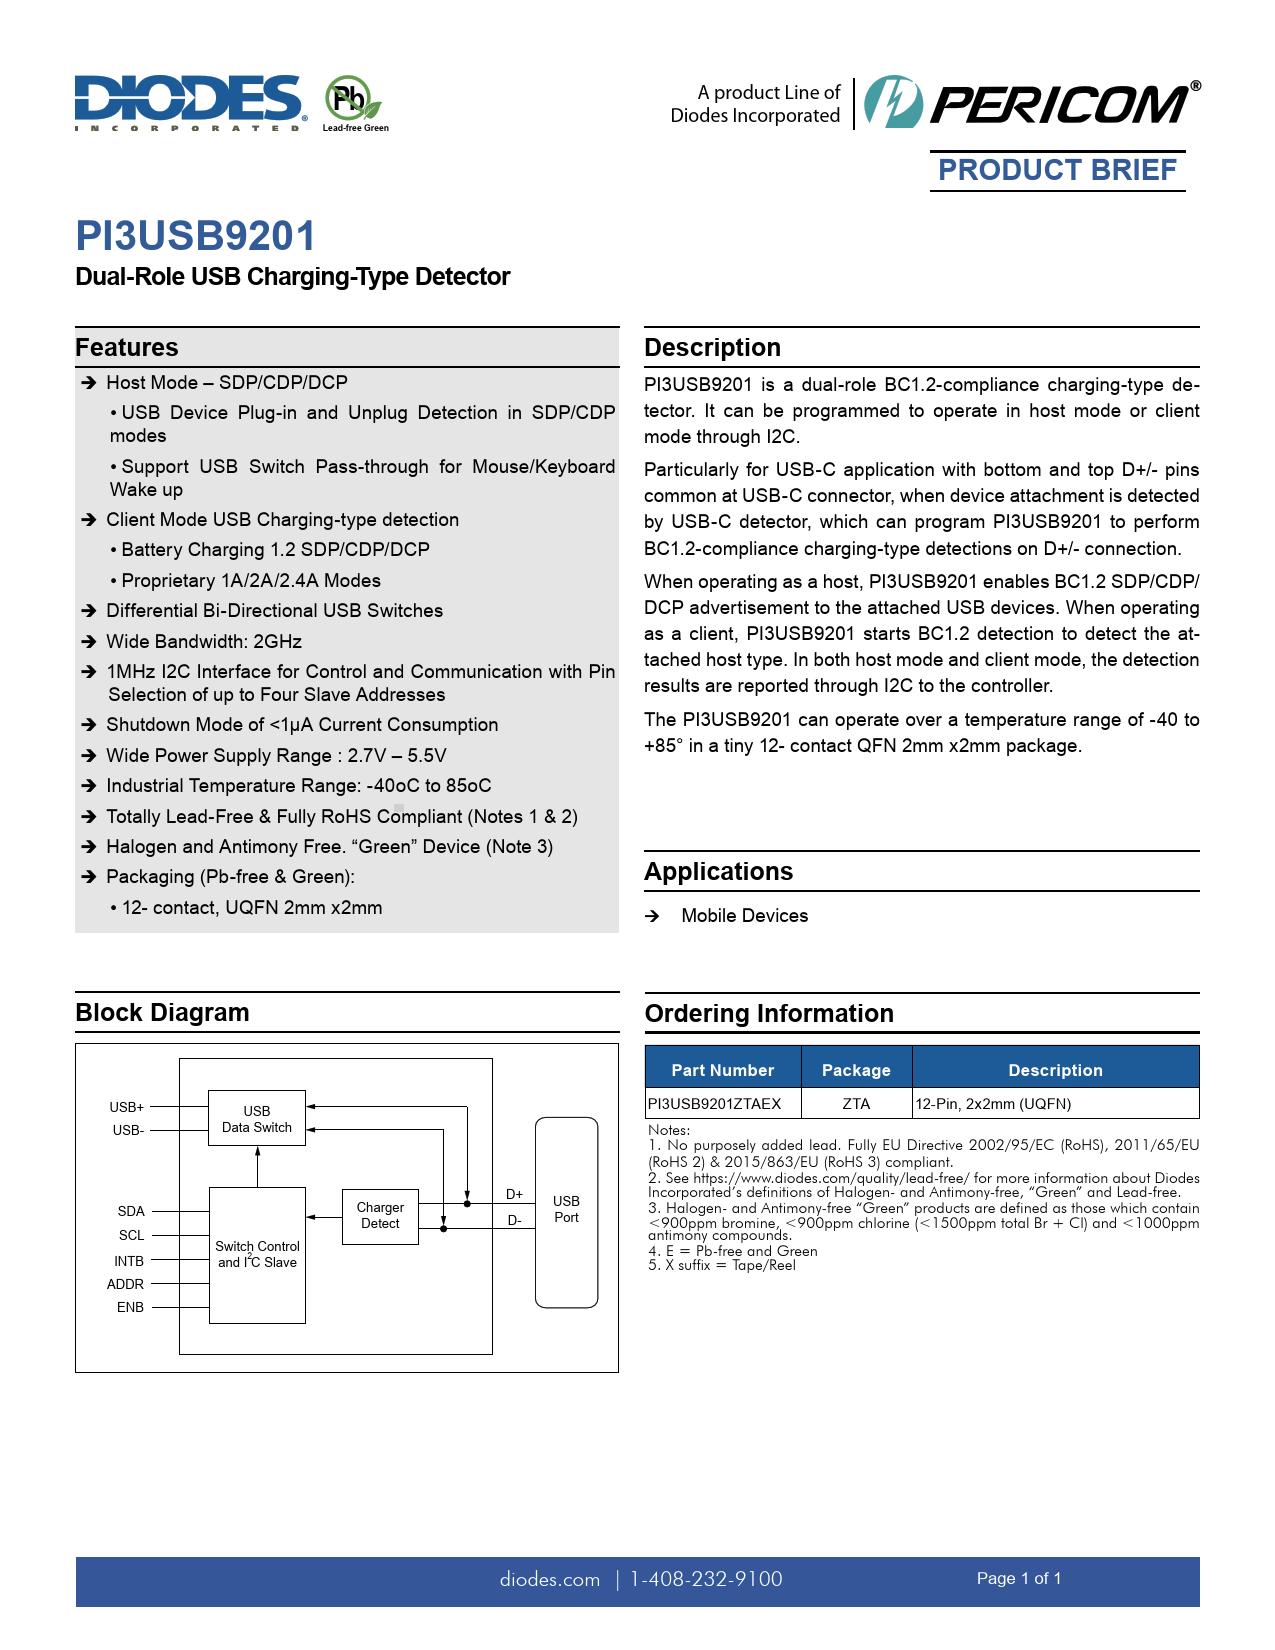 Data Brief PI3USB9201 Diodes